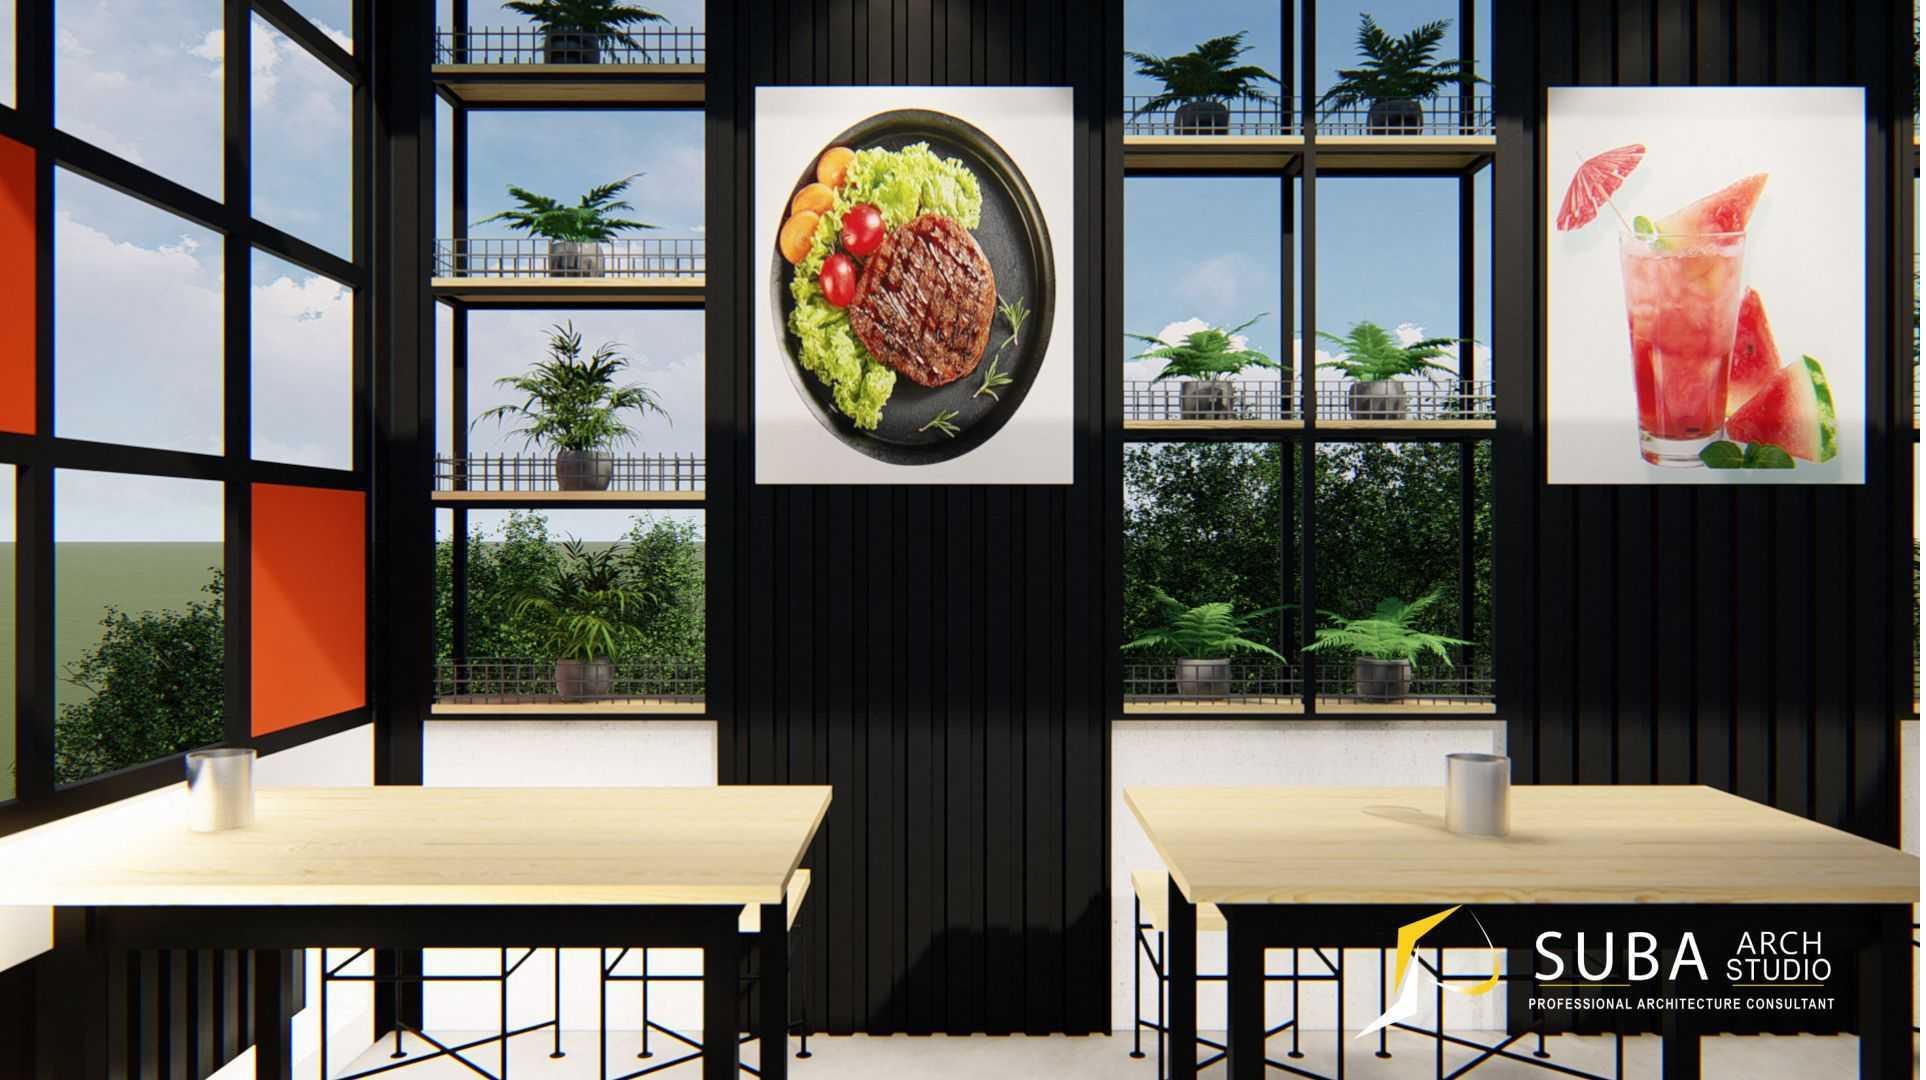 Suba-Arch Desain Gudang Steak Jl Gudang Sukabumi Sukabumi, Jawa Barat, Indonesia Sukabumi, Jawa Barat, Indonesia Suba-Arch-Desain-Gudang-Steak-Jl-Gudang-Sukabumi   72837